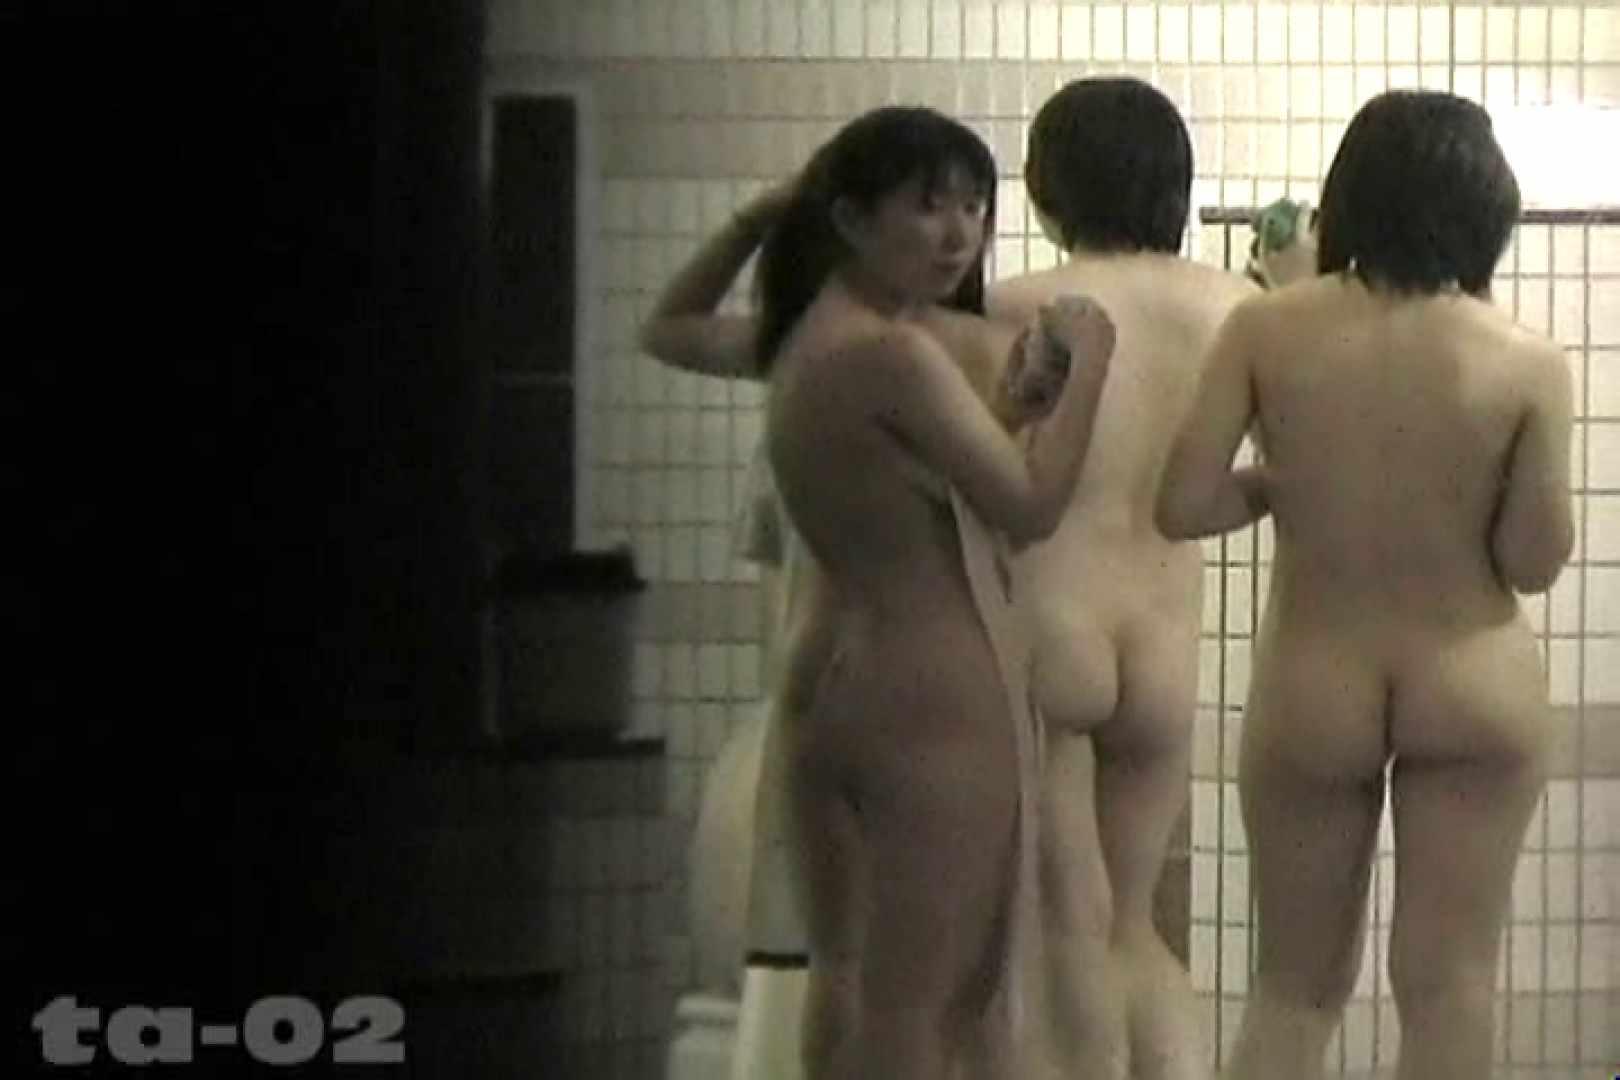 合宿ホテル女風呂盗撮高画質版 Vol.02 盗撮  81PIX 26